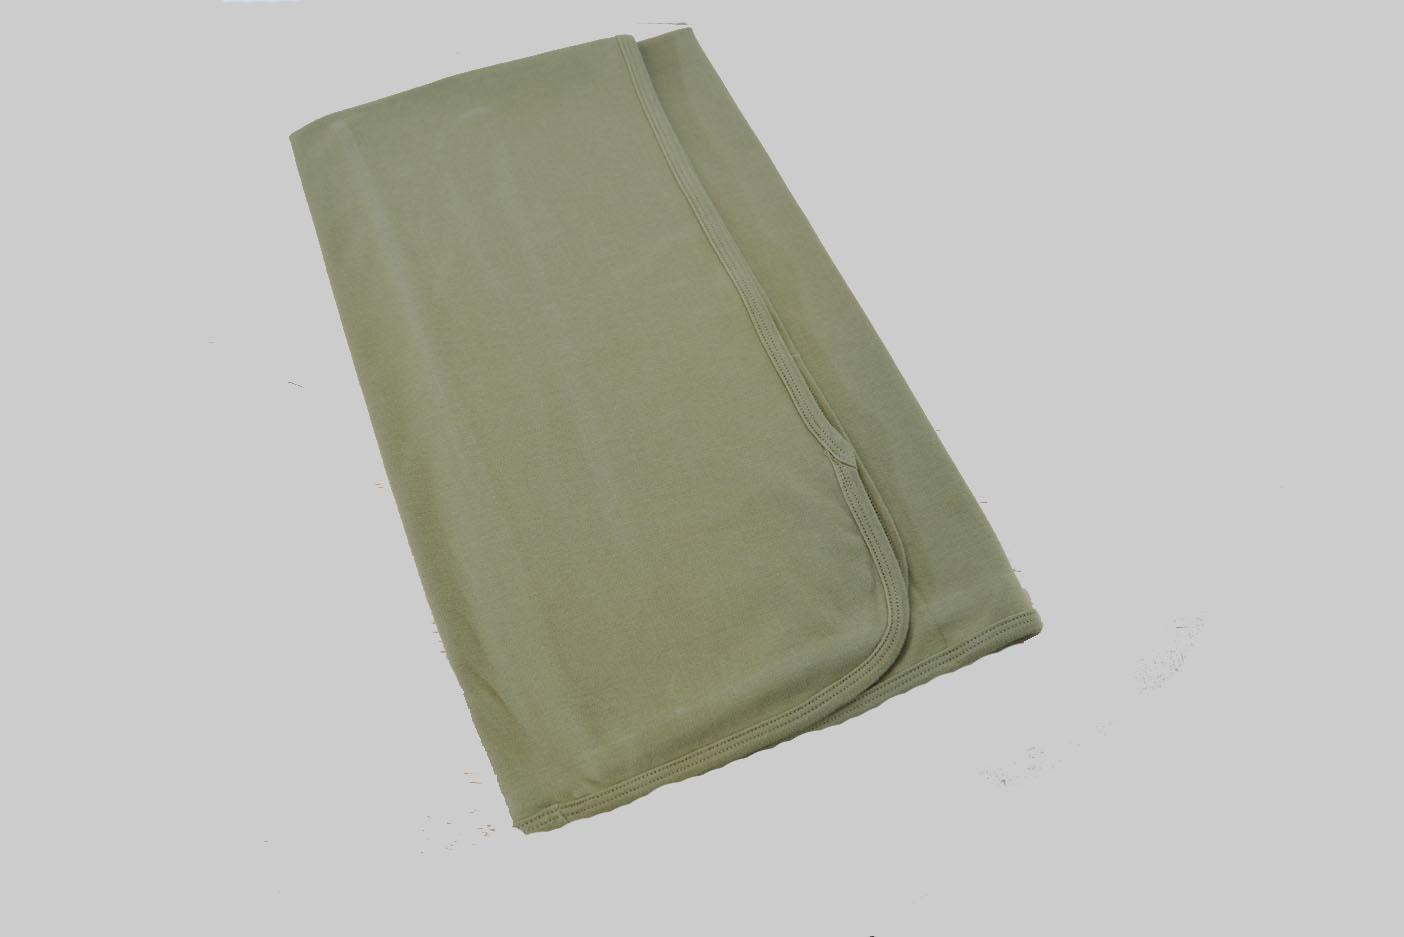 Camouflage Green Receiving Blanket